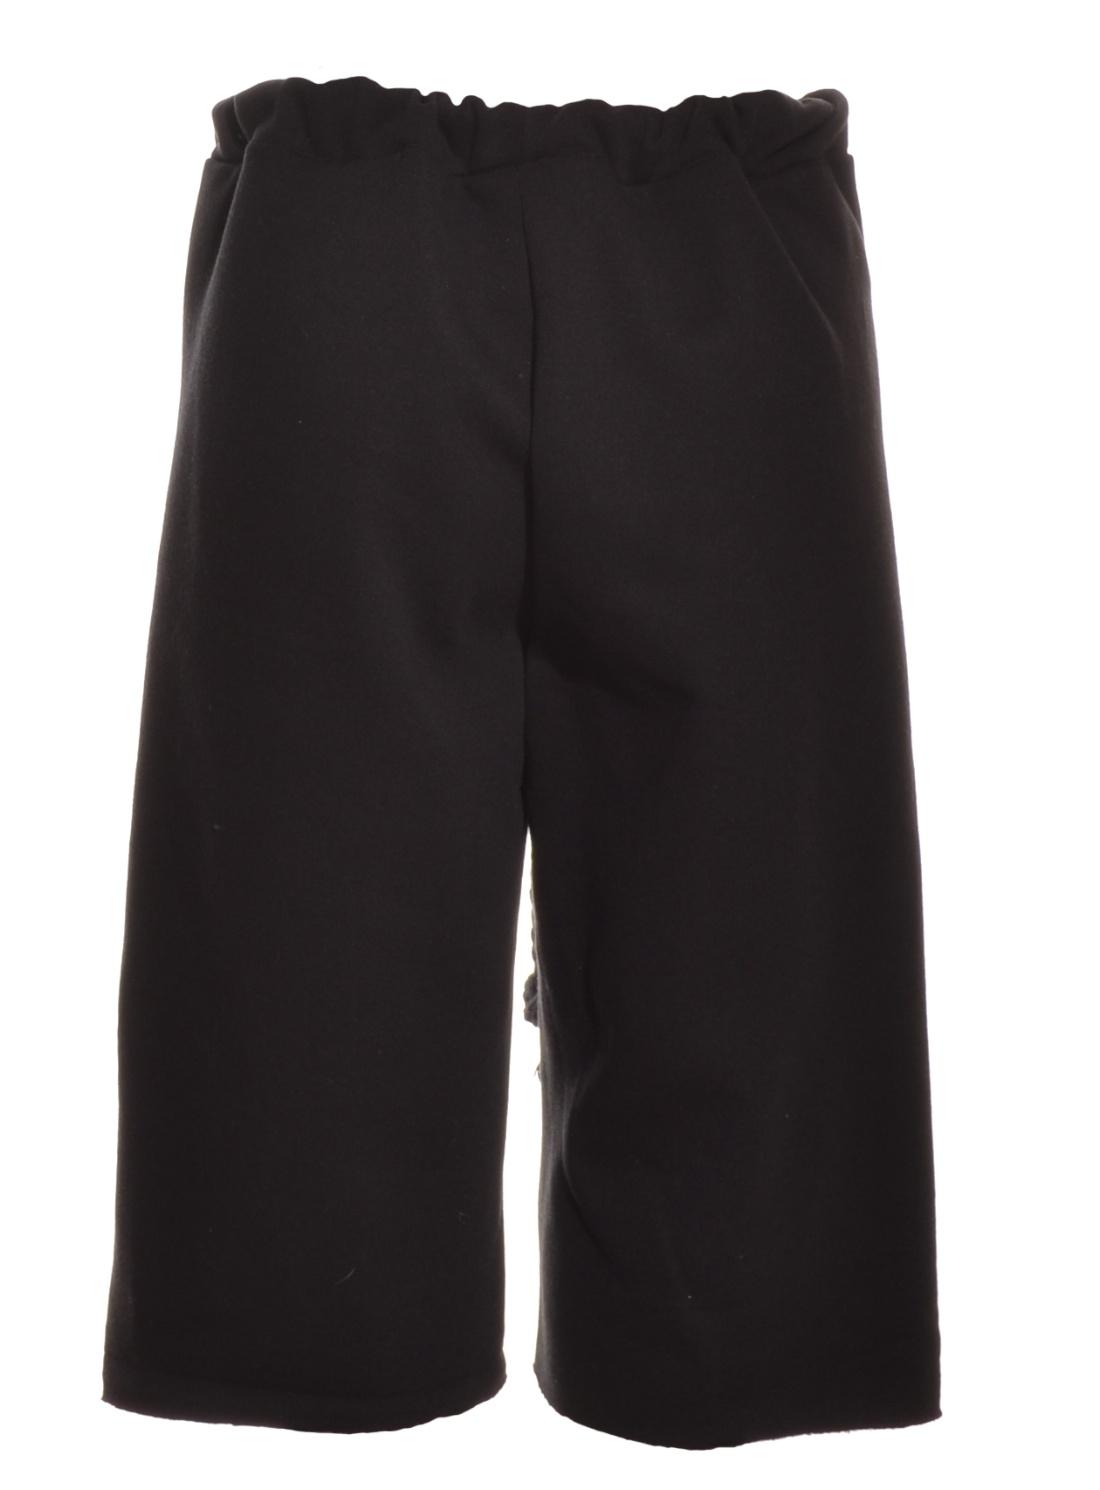 Lyst - Draw In Light Black Cotton Fleece Basketball Shorts ...